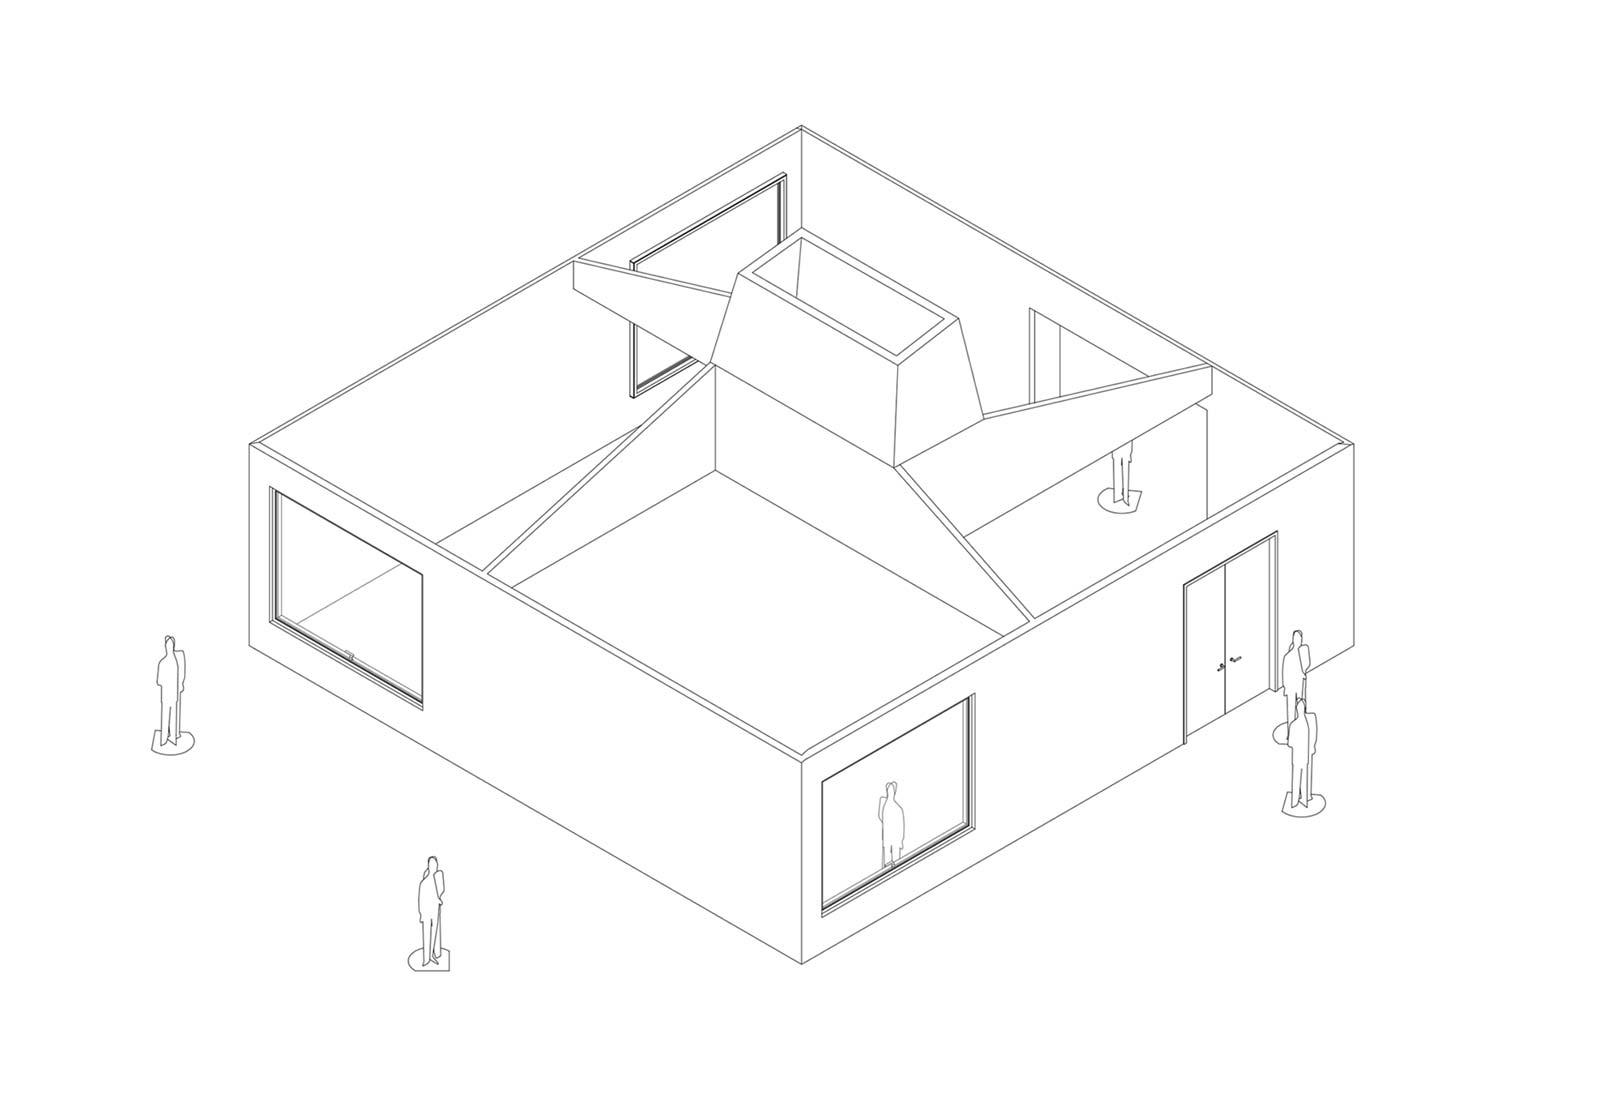 Und mang architektur projekte for Architektur axonometrie